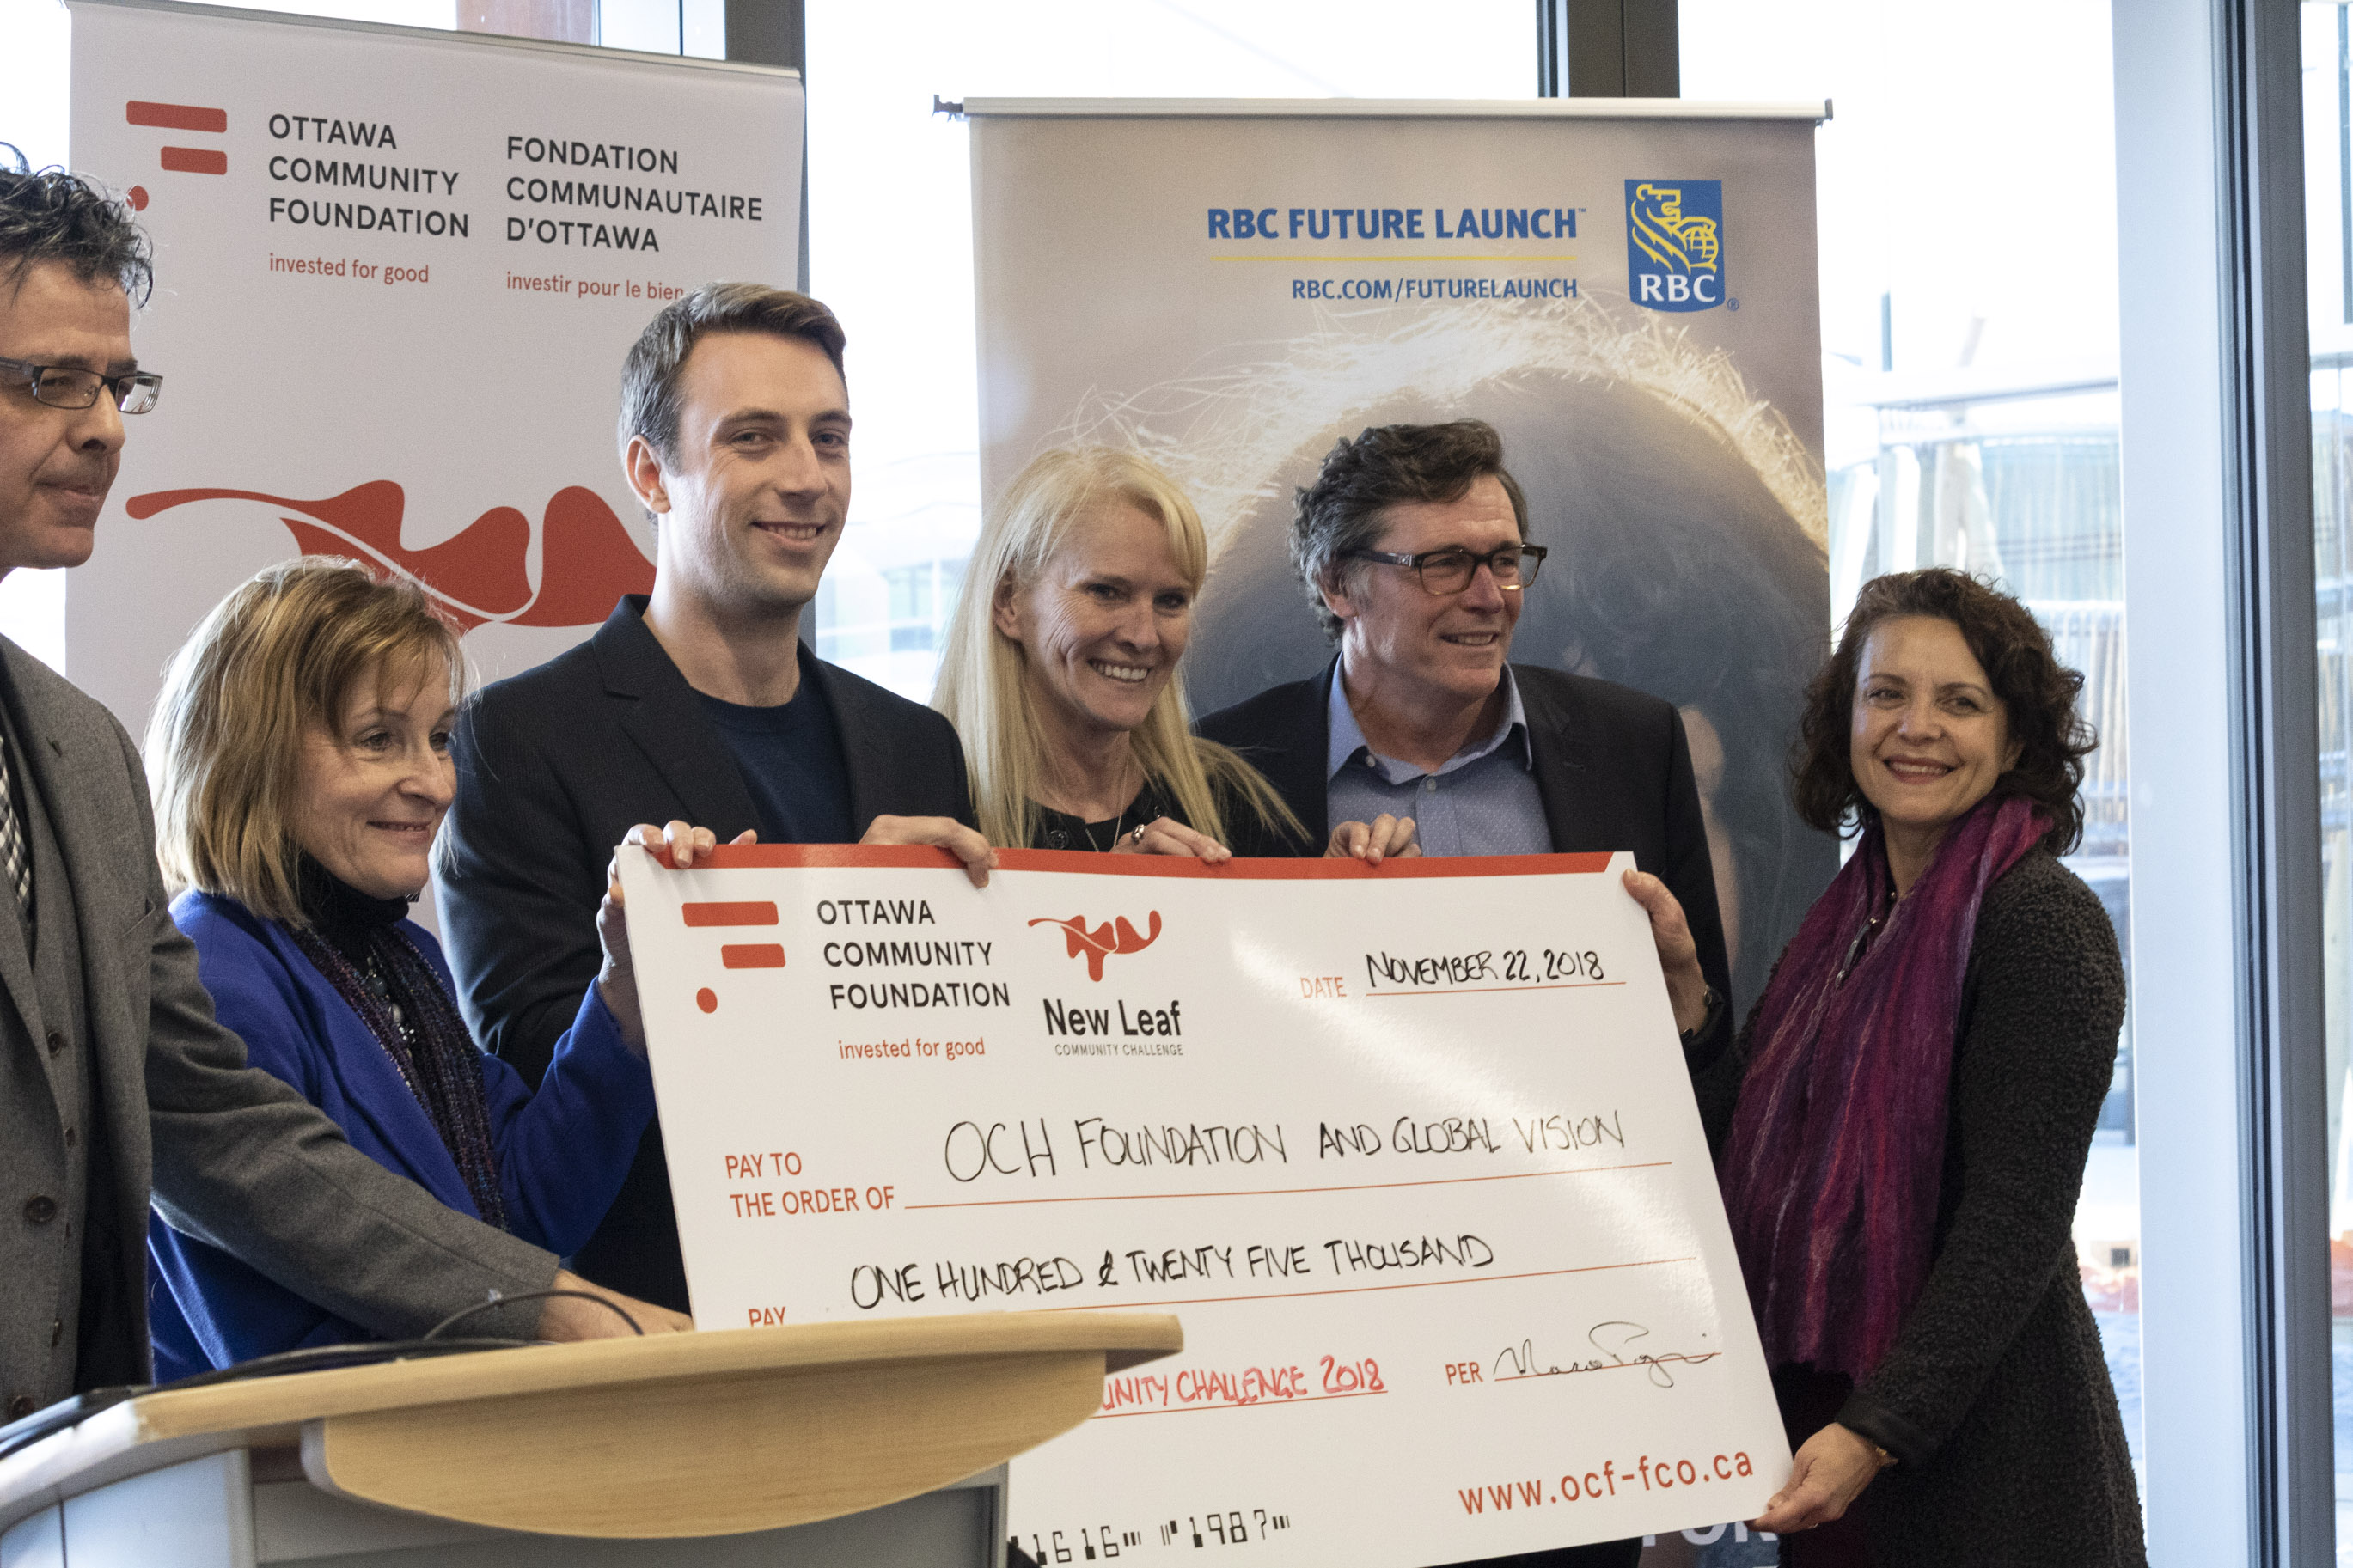 NEWS RELEASE - Ottawa Community Foundation Awards $125,000 to the